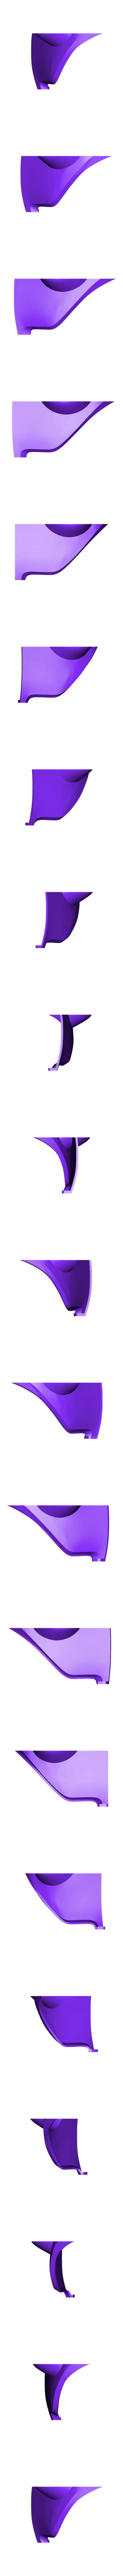 Part_7_v4.stl Download free STL file  Blood Dragon Helmet Mass Effect 2 (With Back Access) • 3D printable template, VillainousPropShop